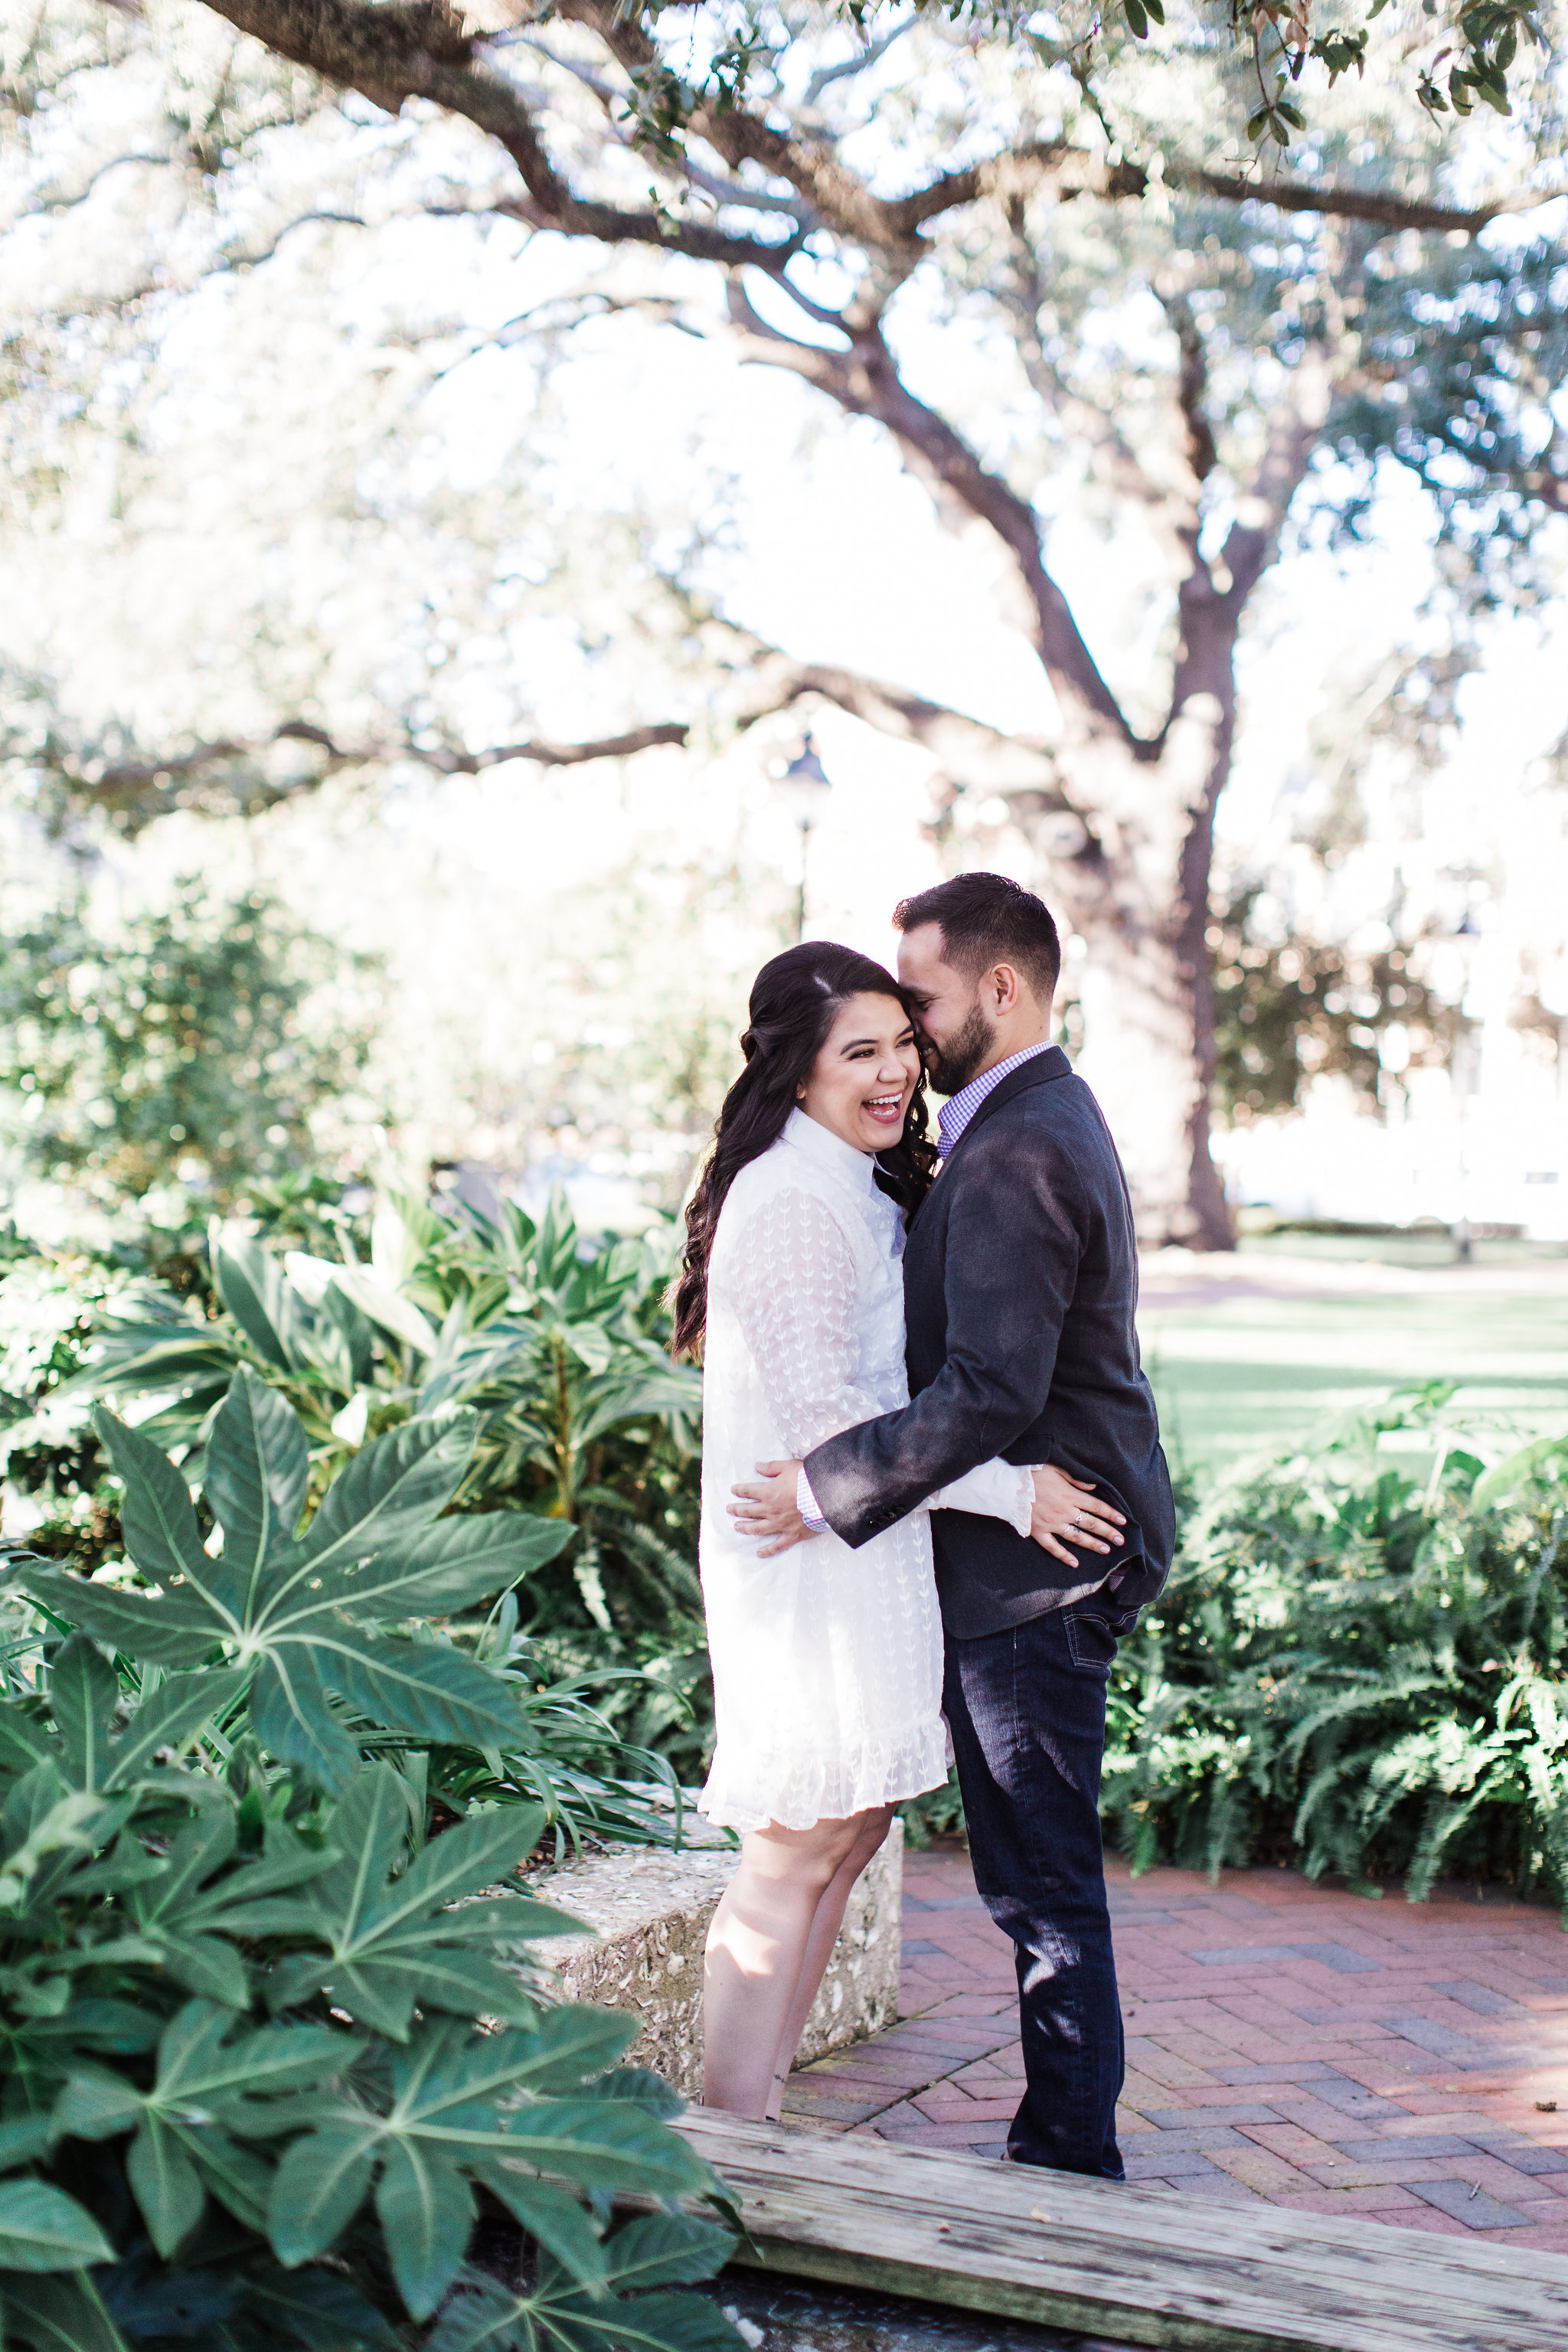 apt-b-photography-Savannah-wedding-photographer-savannah-engagement-photographer-historic-savannah-engagement-savannah-weddings-hilton-head-wedding-photographer-hilton-head-engagement-17.jpg